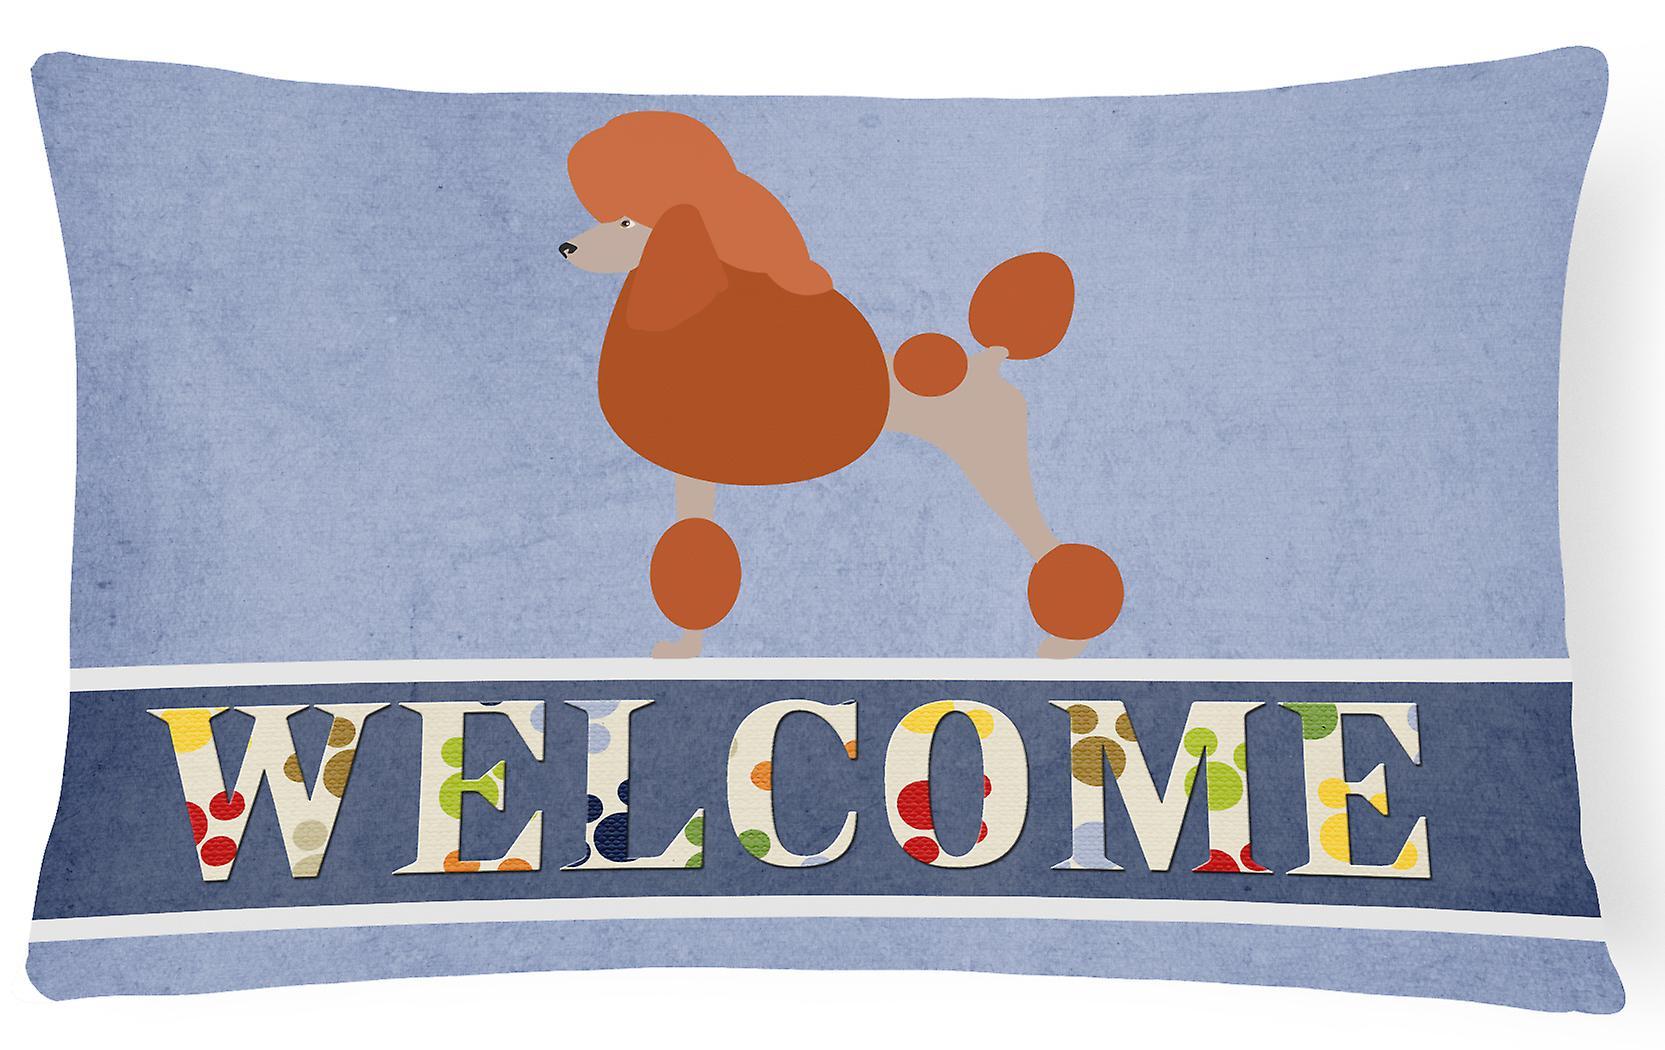 Poodle Royal Canvas Decorative Fabric Welcome Pillow tsCQrdhx